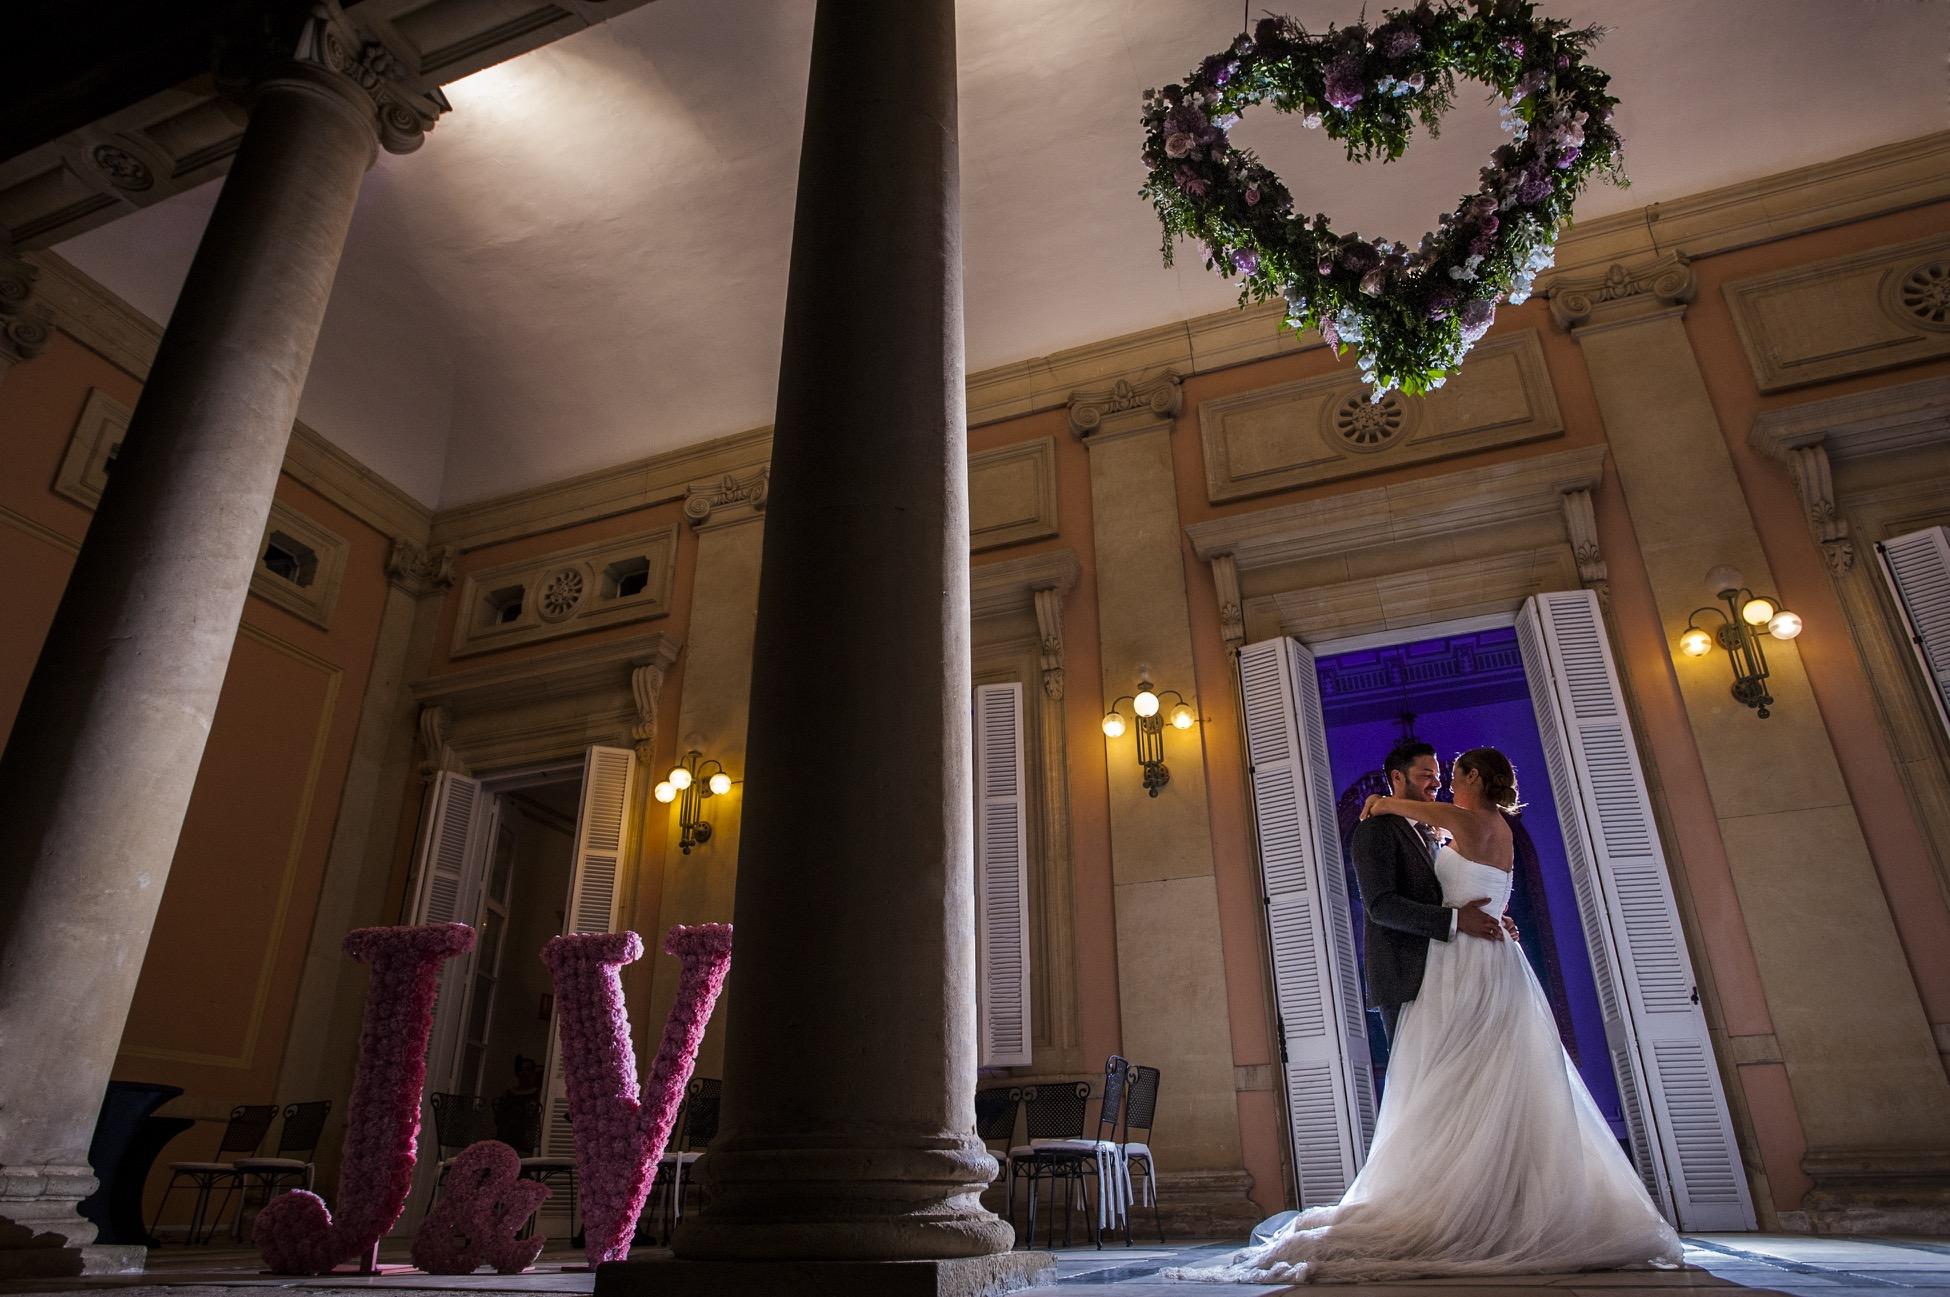 Si-Quiero-Wedding-Planner-By-Sira-Antequera-Virginia-Jose-18